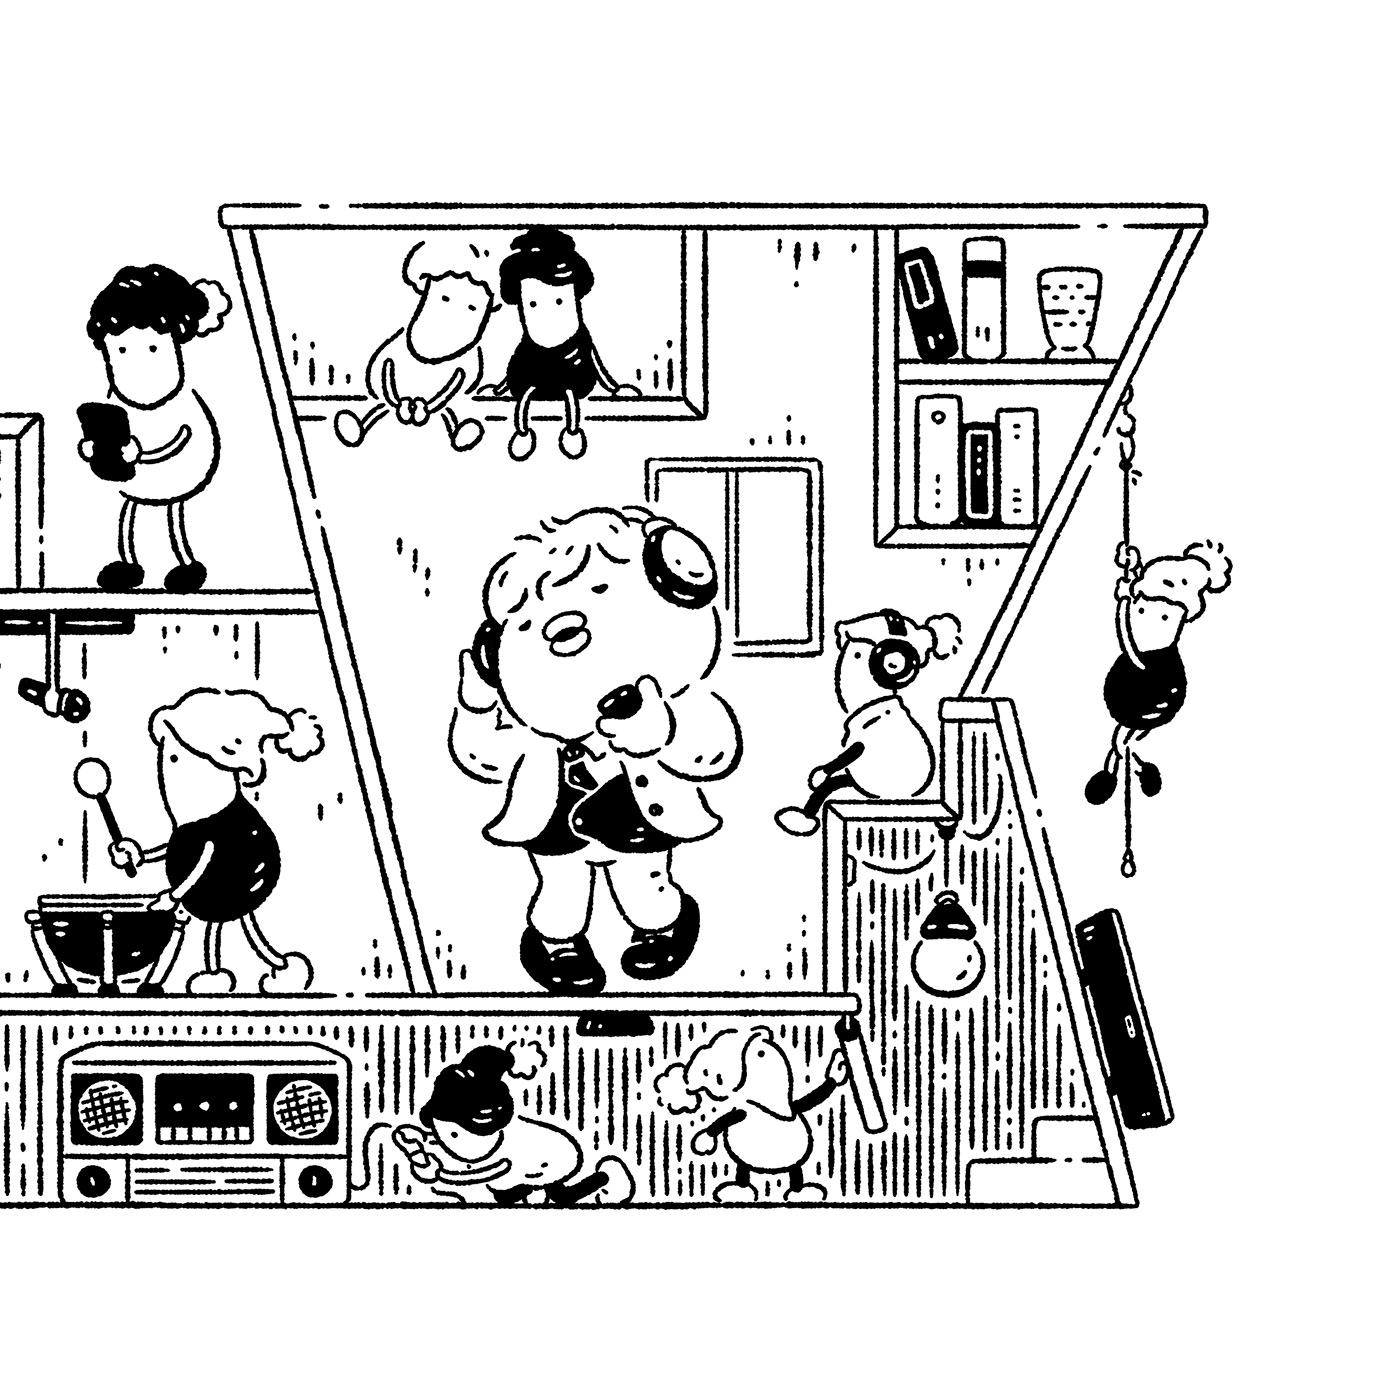 art ILLUSTRATION  popoland 插畫 波寶島 繪圖 藝術 角色 簡約 黑白